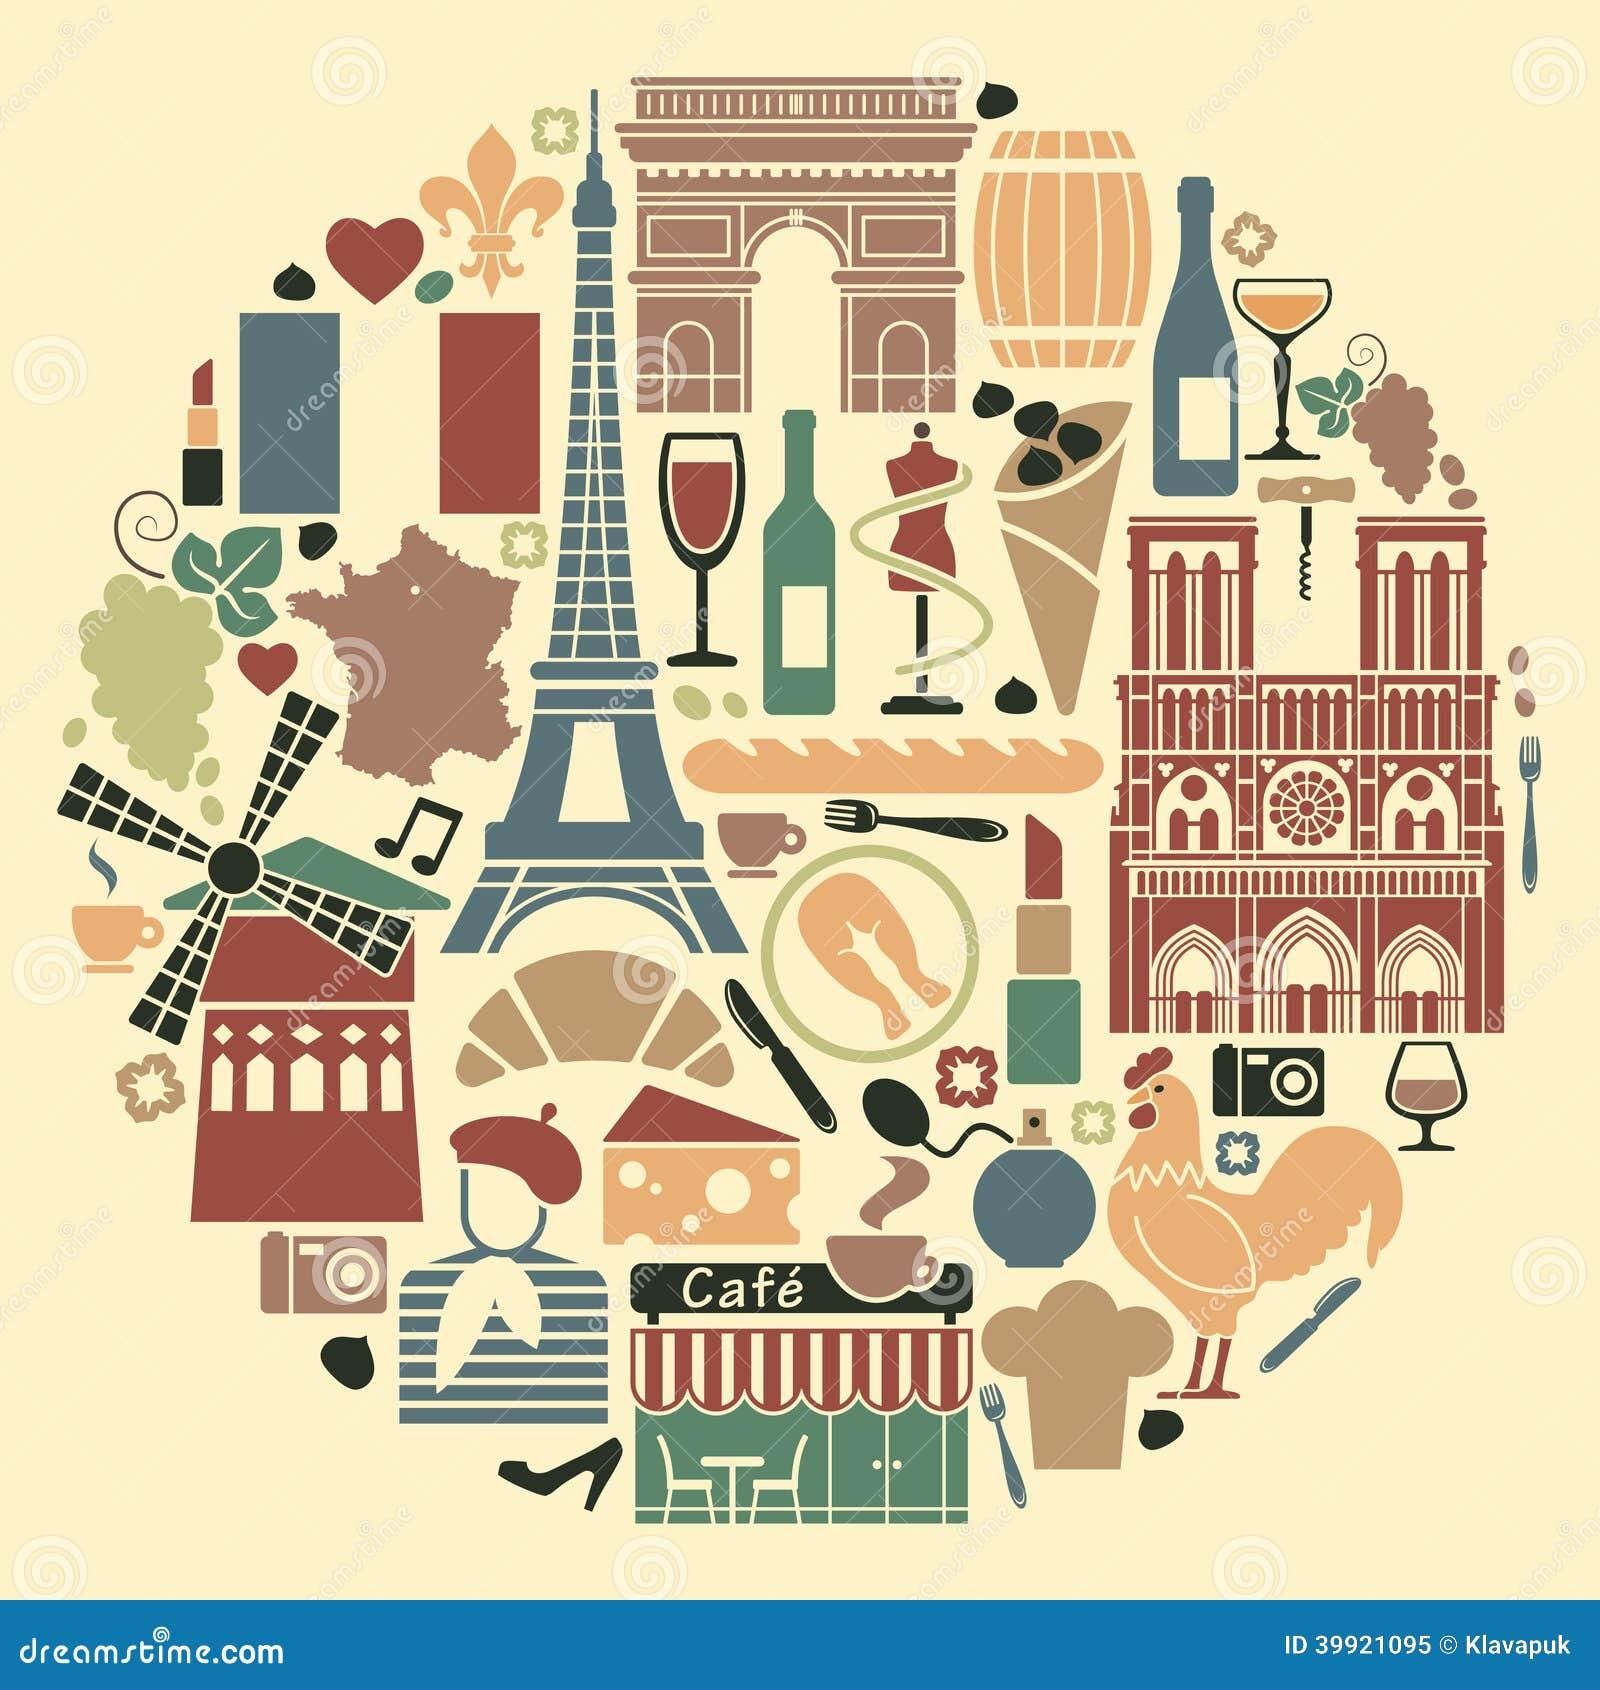 Символы франции в форме круга